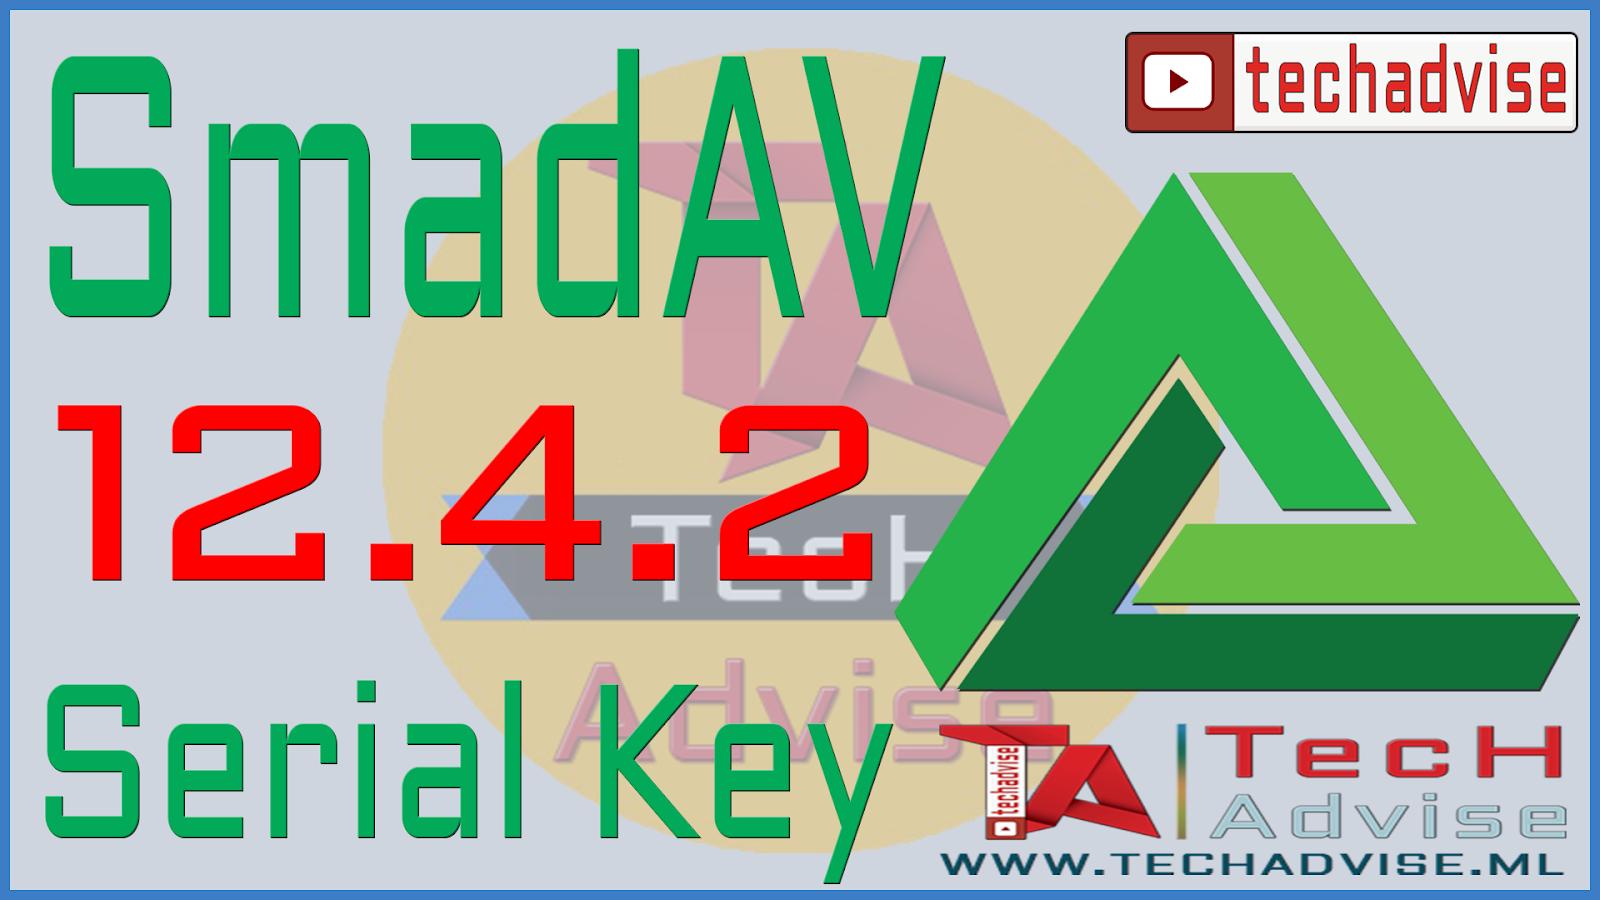 SmadAV, SmadAV key, SmadAV Crack, SmadAV keygen, SmadAV serial key, SmadAV licence key, SmadAV 12.4, SmadAV 12.4.2 key, SmadAV 12.4.2 full, SmadAV 12.4.2 keys, SmadAV 12.4.2 crack, SmadAV 12.4.2 keygen, SmadAV 12.4.2 serials,